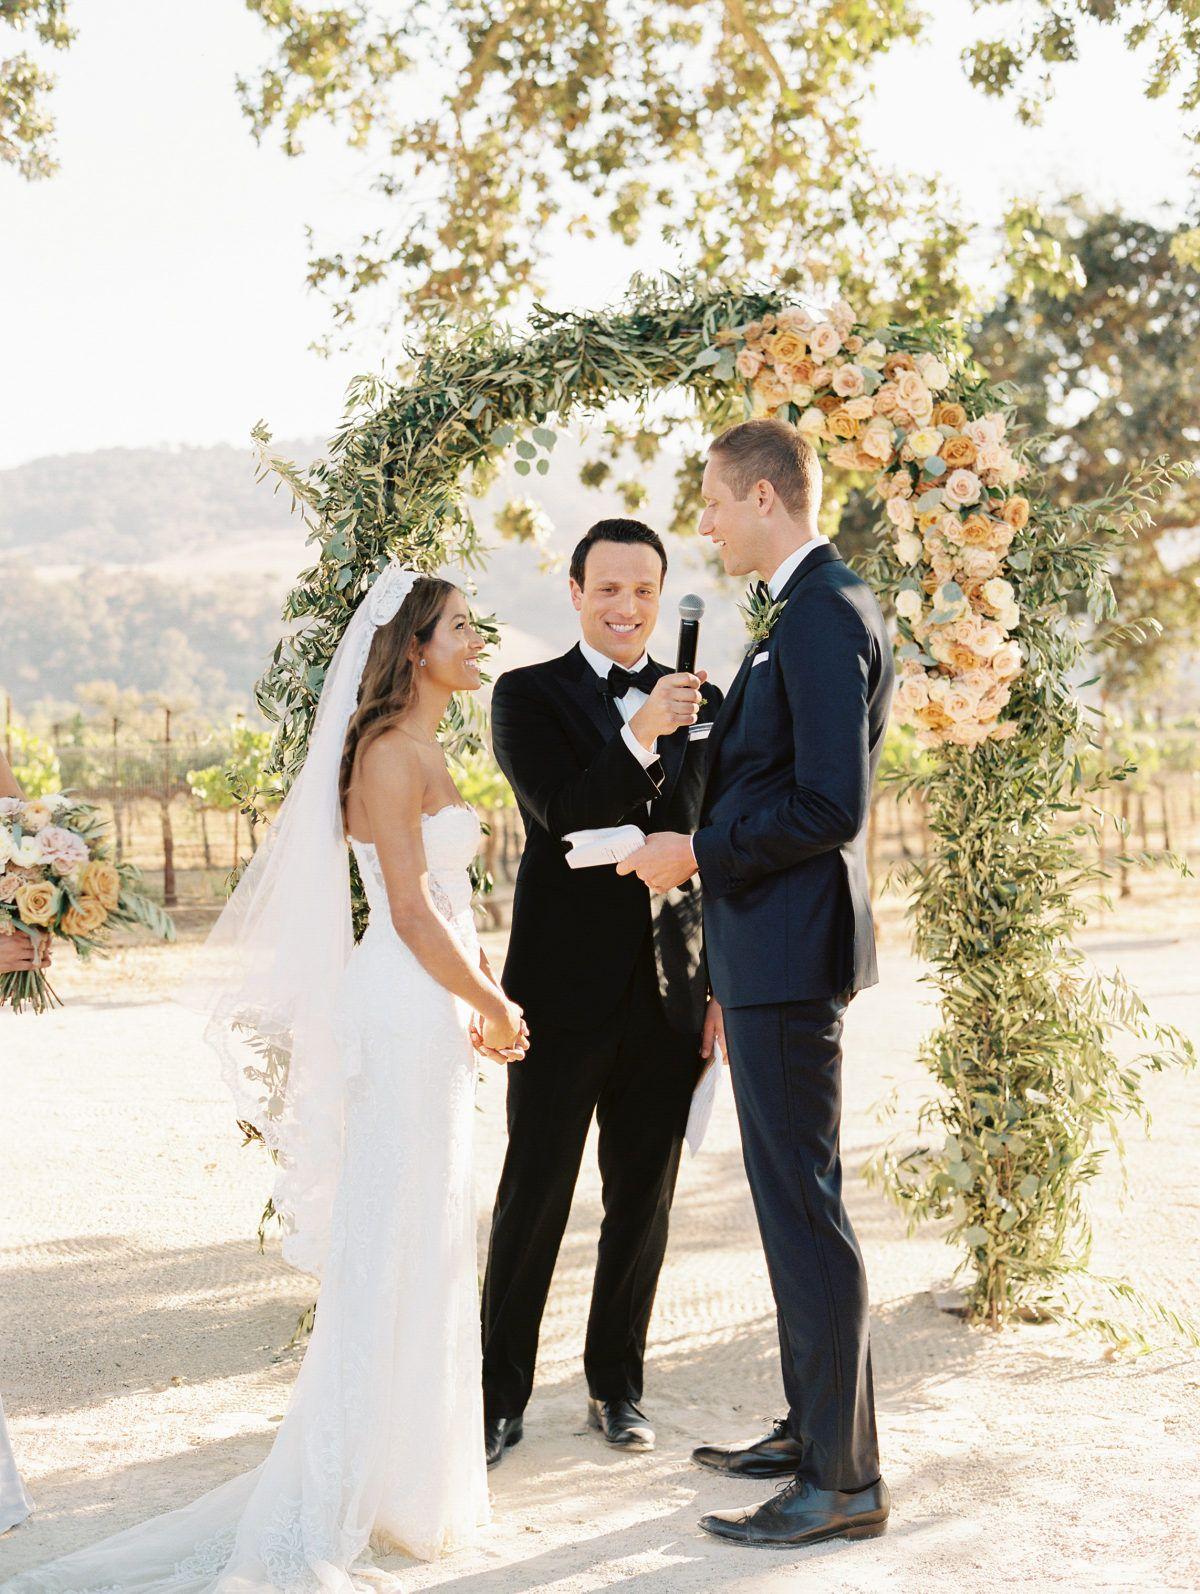 Vows At The Vineyard Wedding Wedding Officiant Stunning Bride Wedding